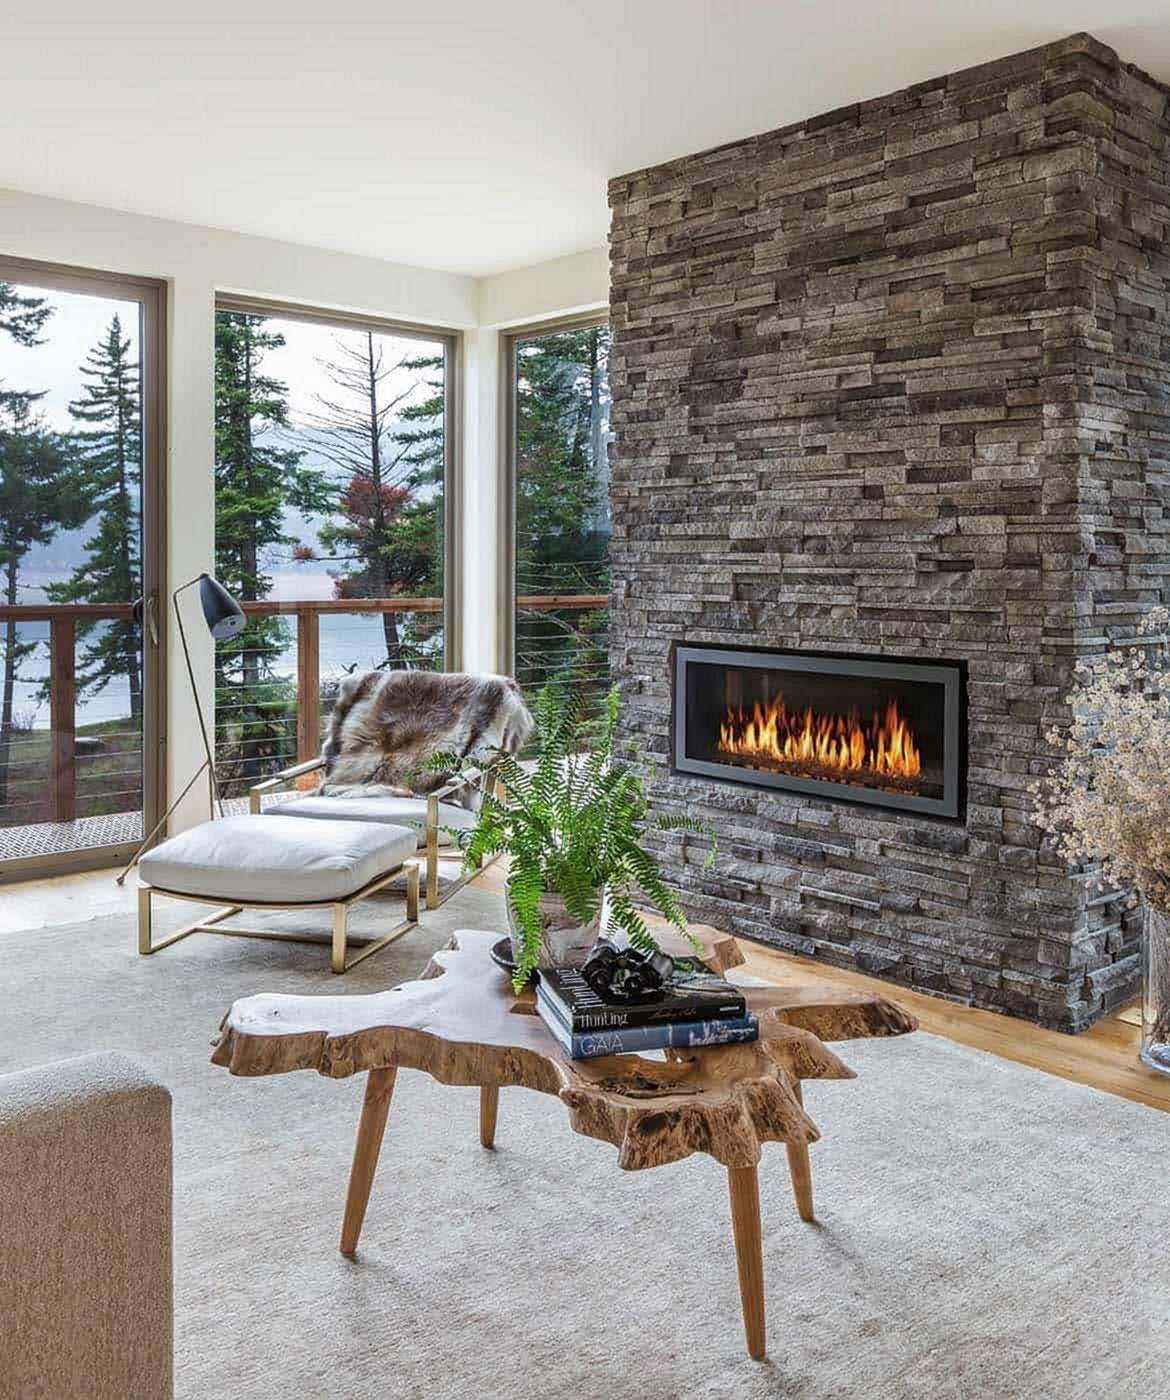 17 Incredible Winter Home Decoration Design With Unique ...